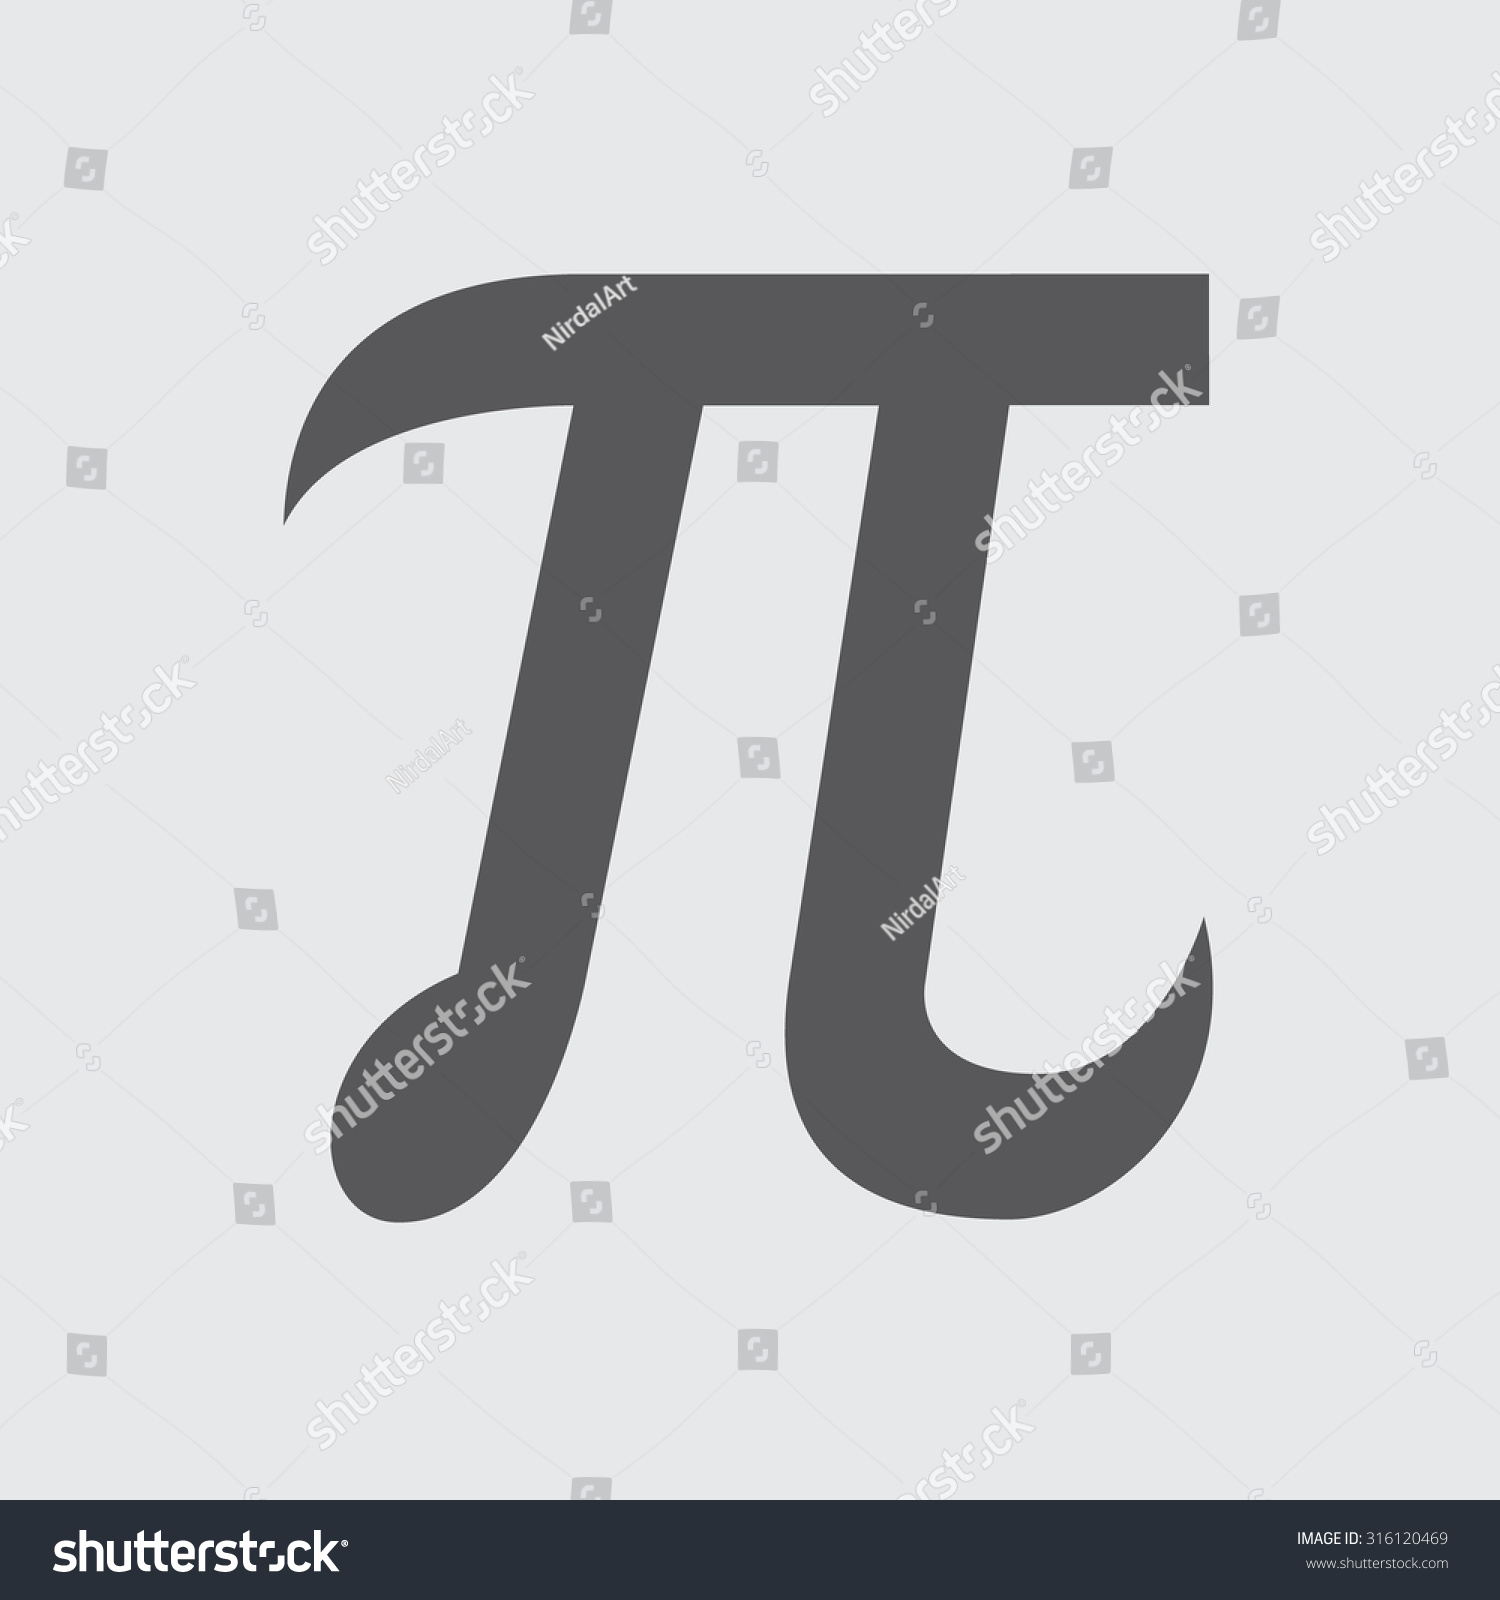 Pi symbol icon stock vektorgrafik 316120469 shutterstock pi symbol icon biocorpaavc Image collections